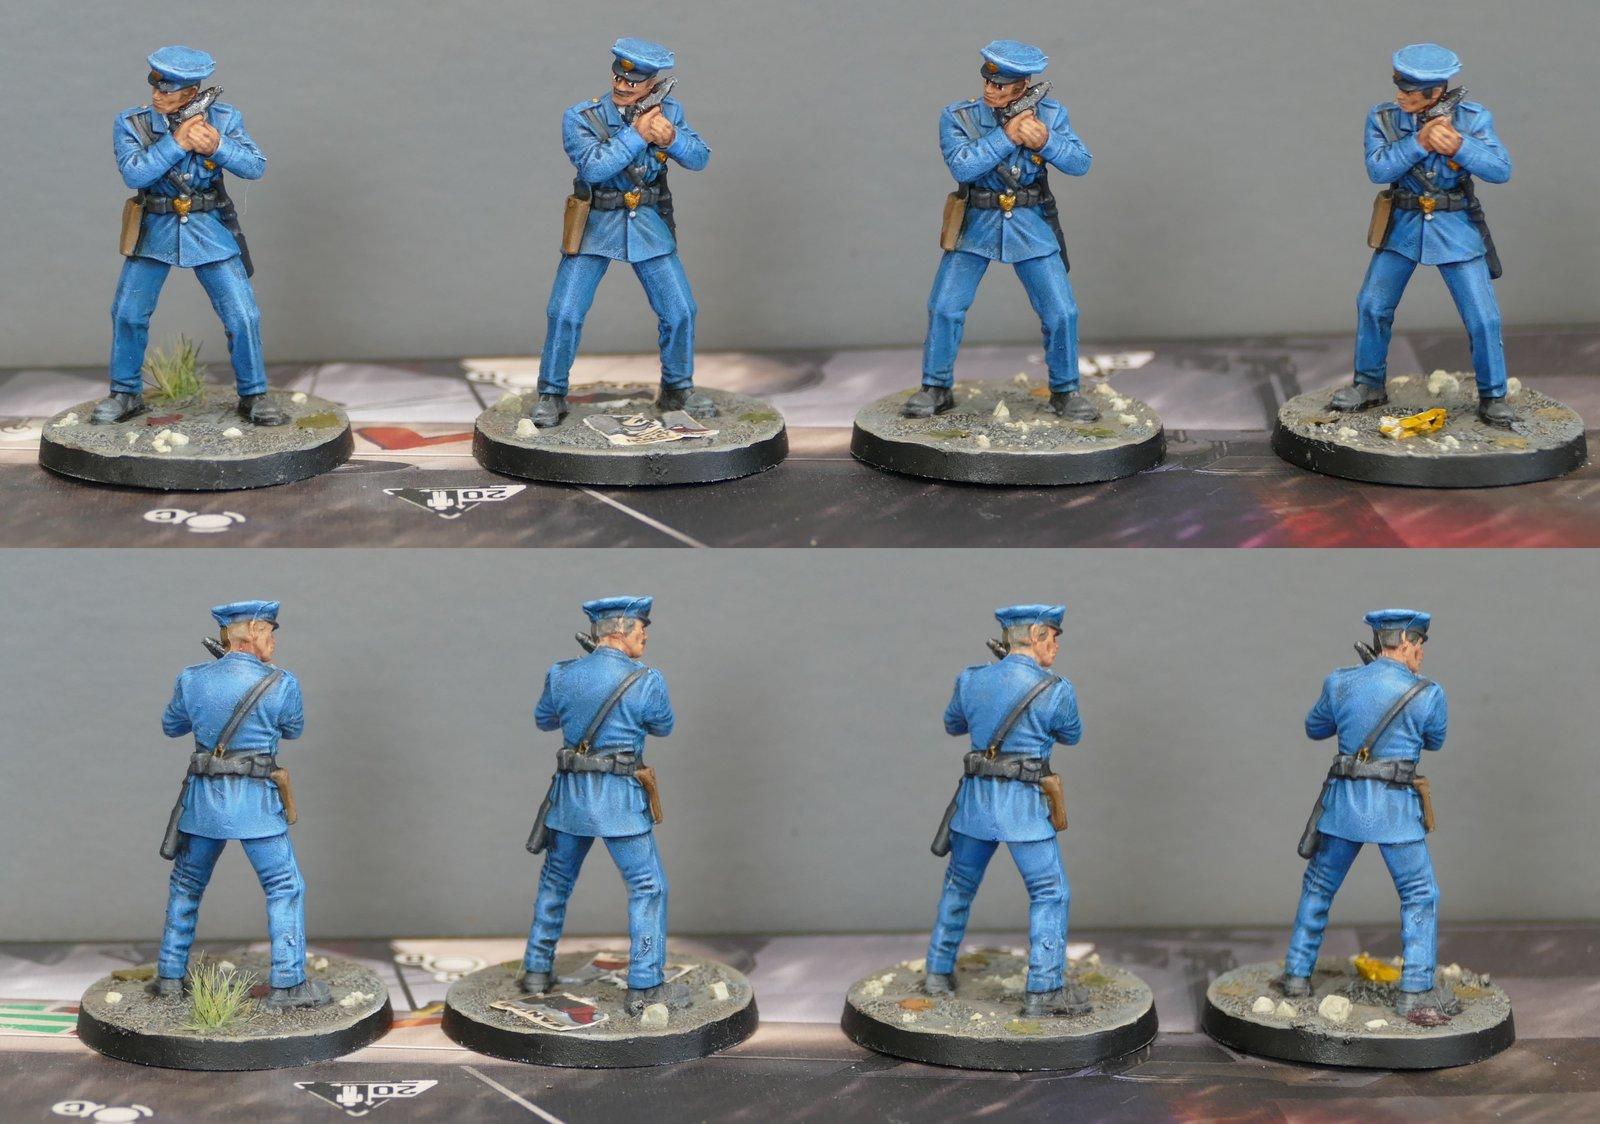 GCPD Officers with Handgun_Low.jpg